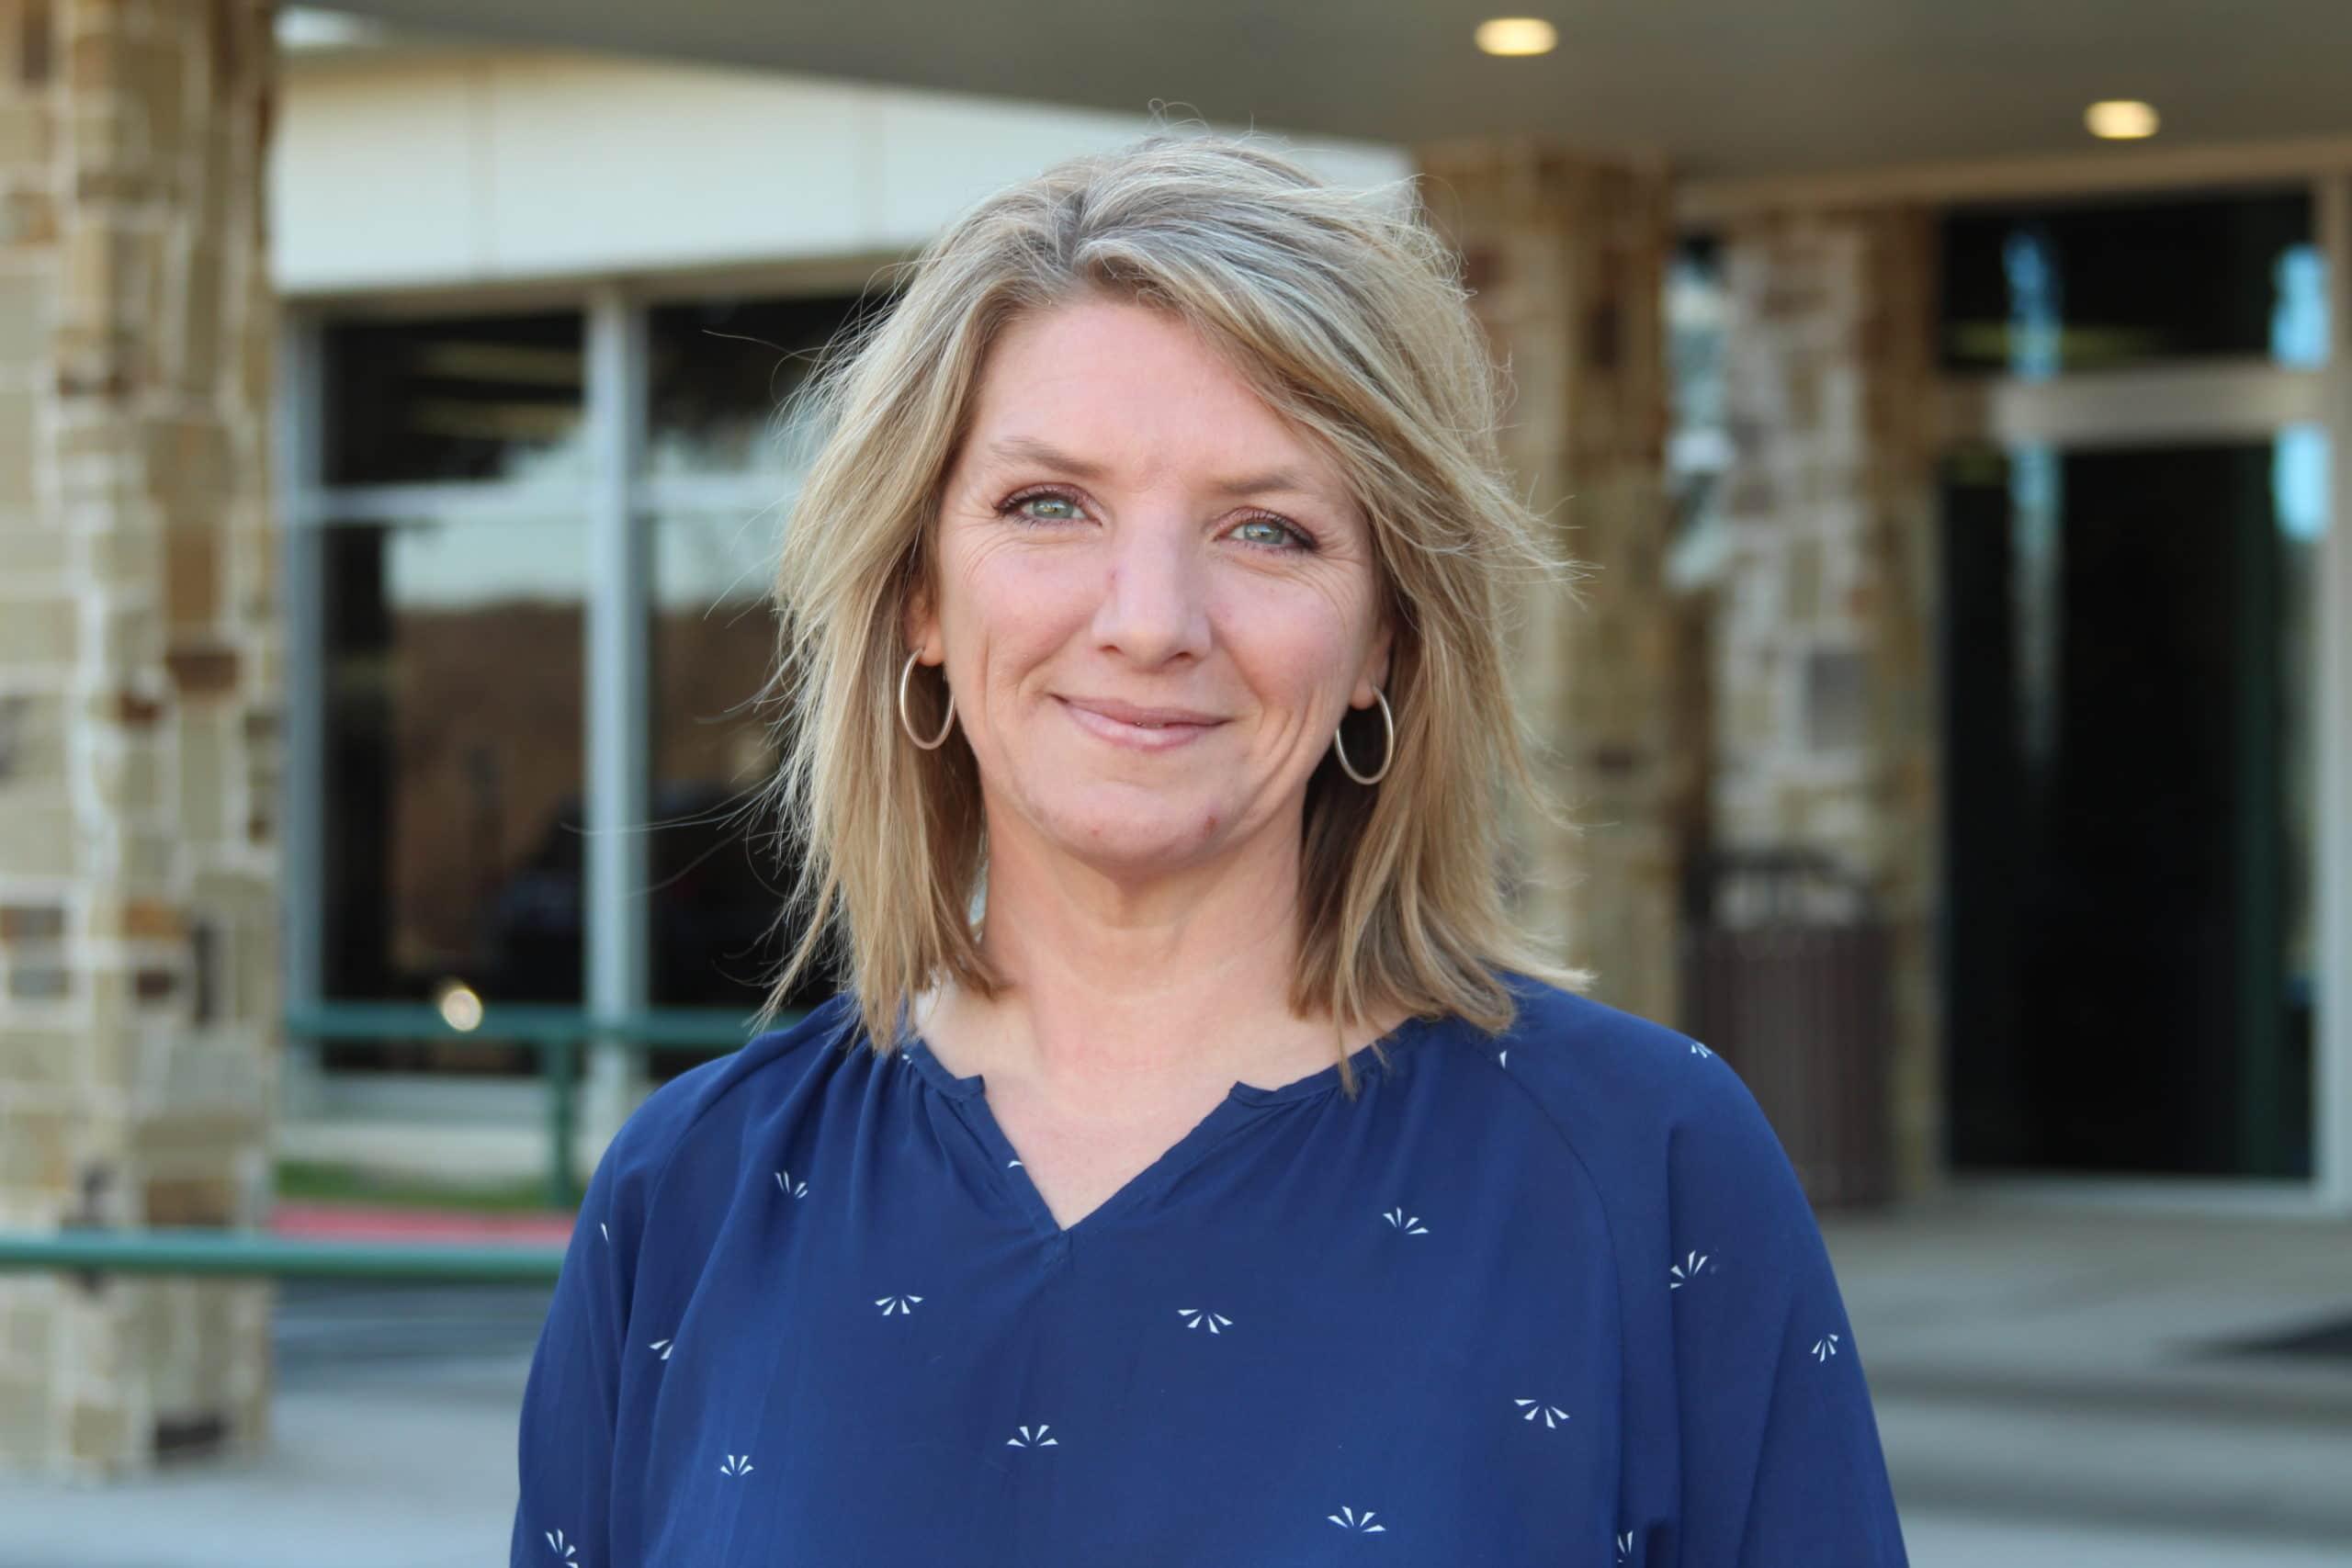 Lindsay Winburn, BSN, RN